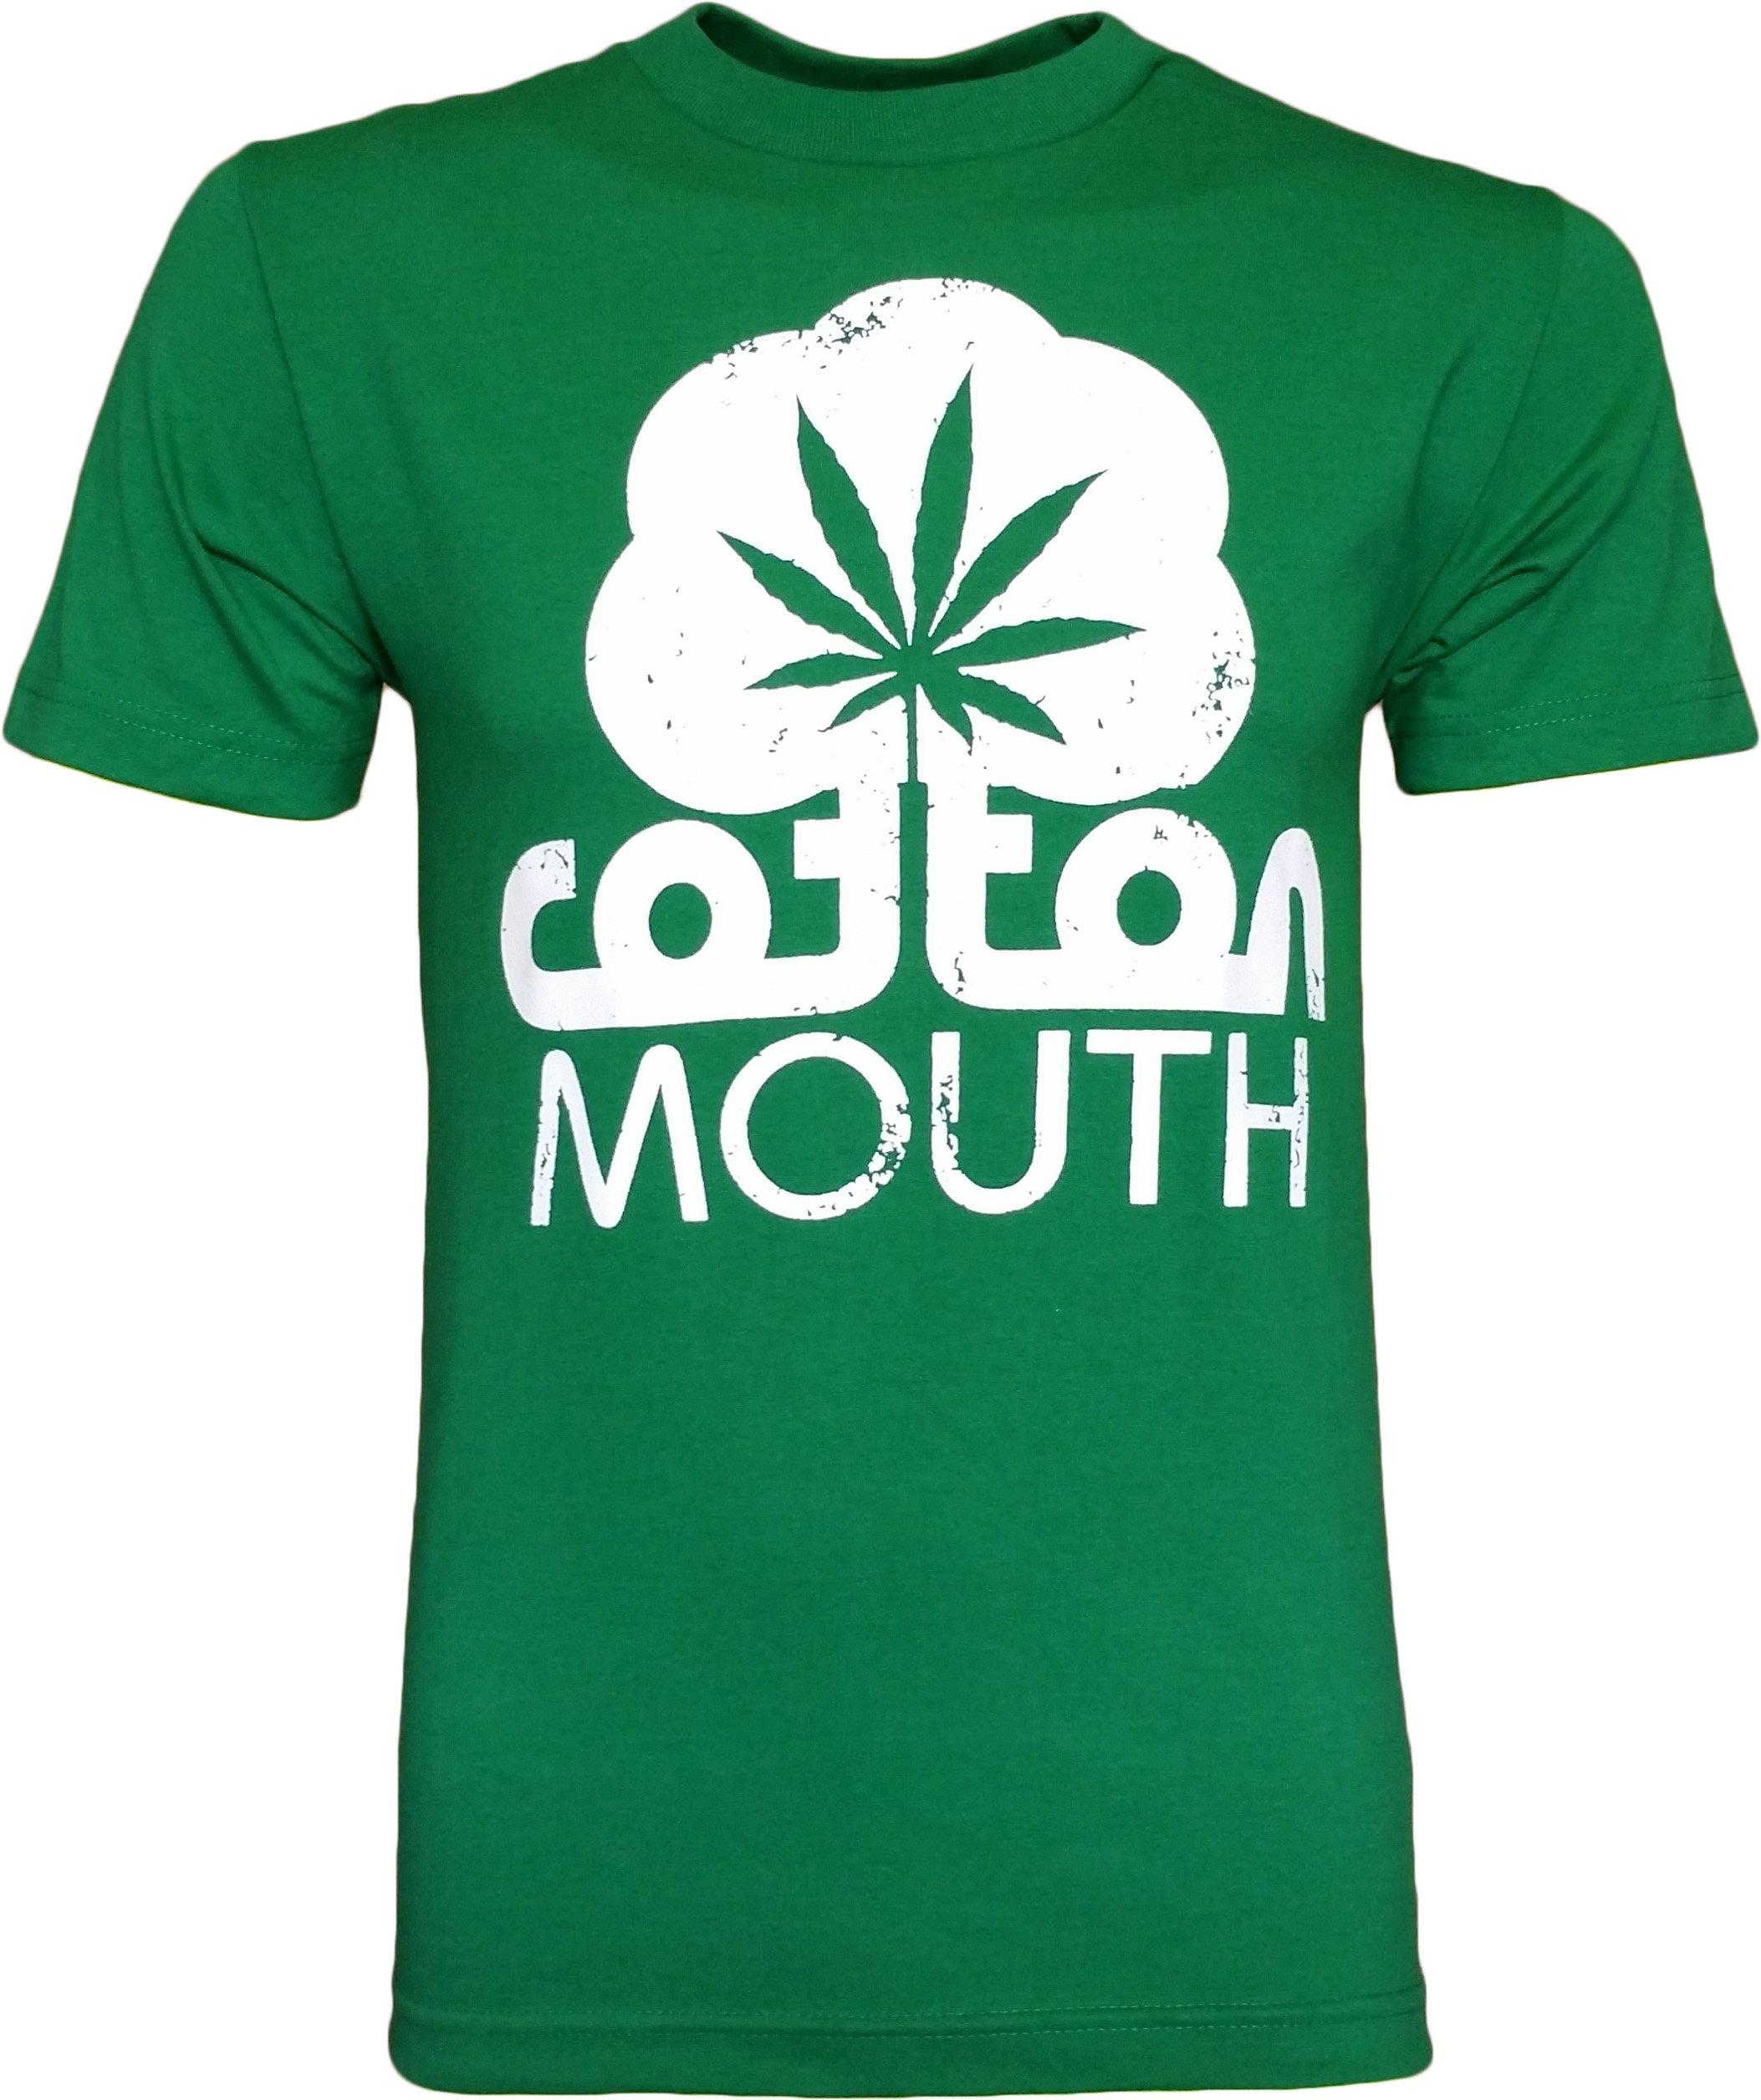 Cotton Mouth 420 Marijuana Weed Blunt Cannabis Dank